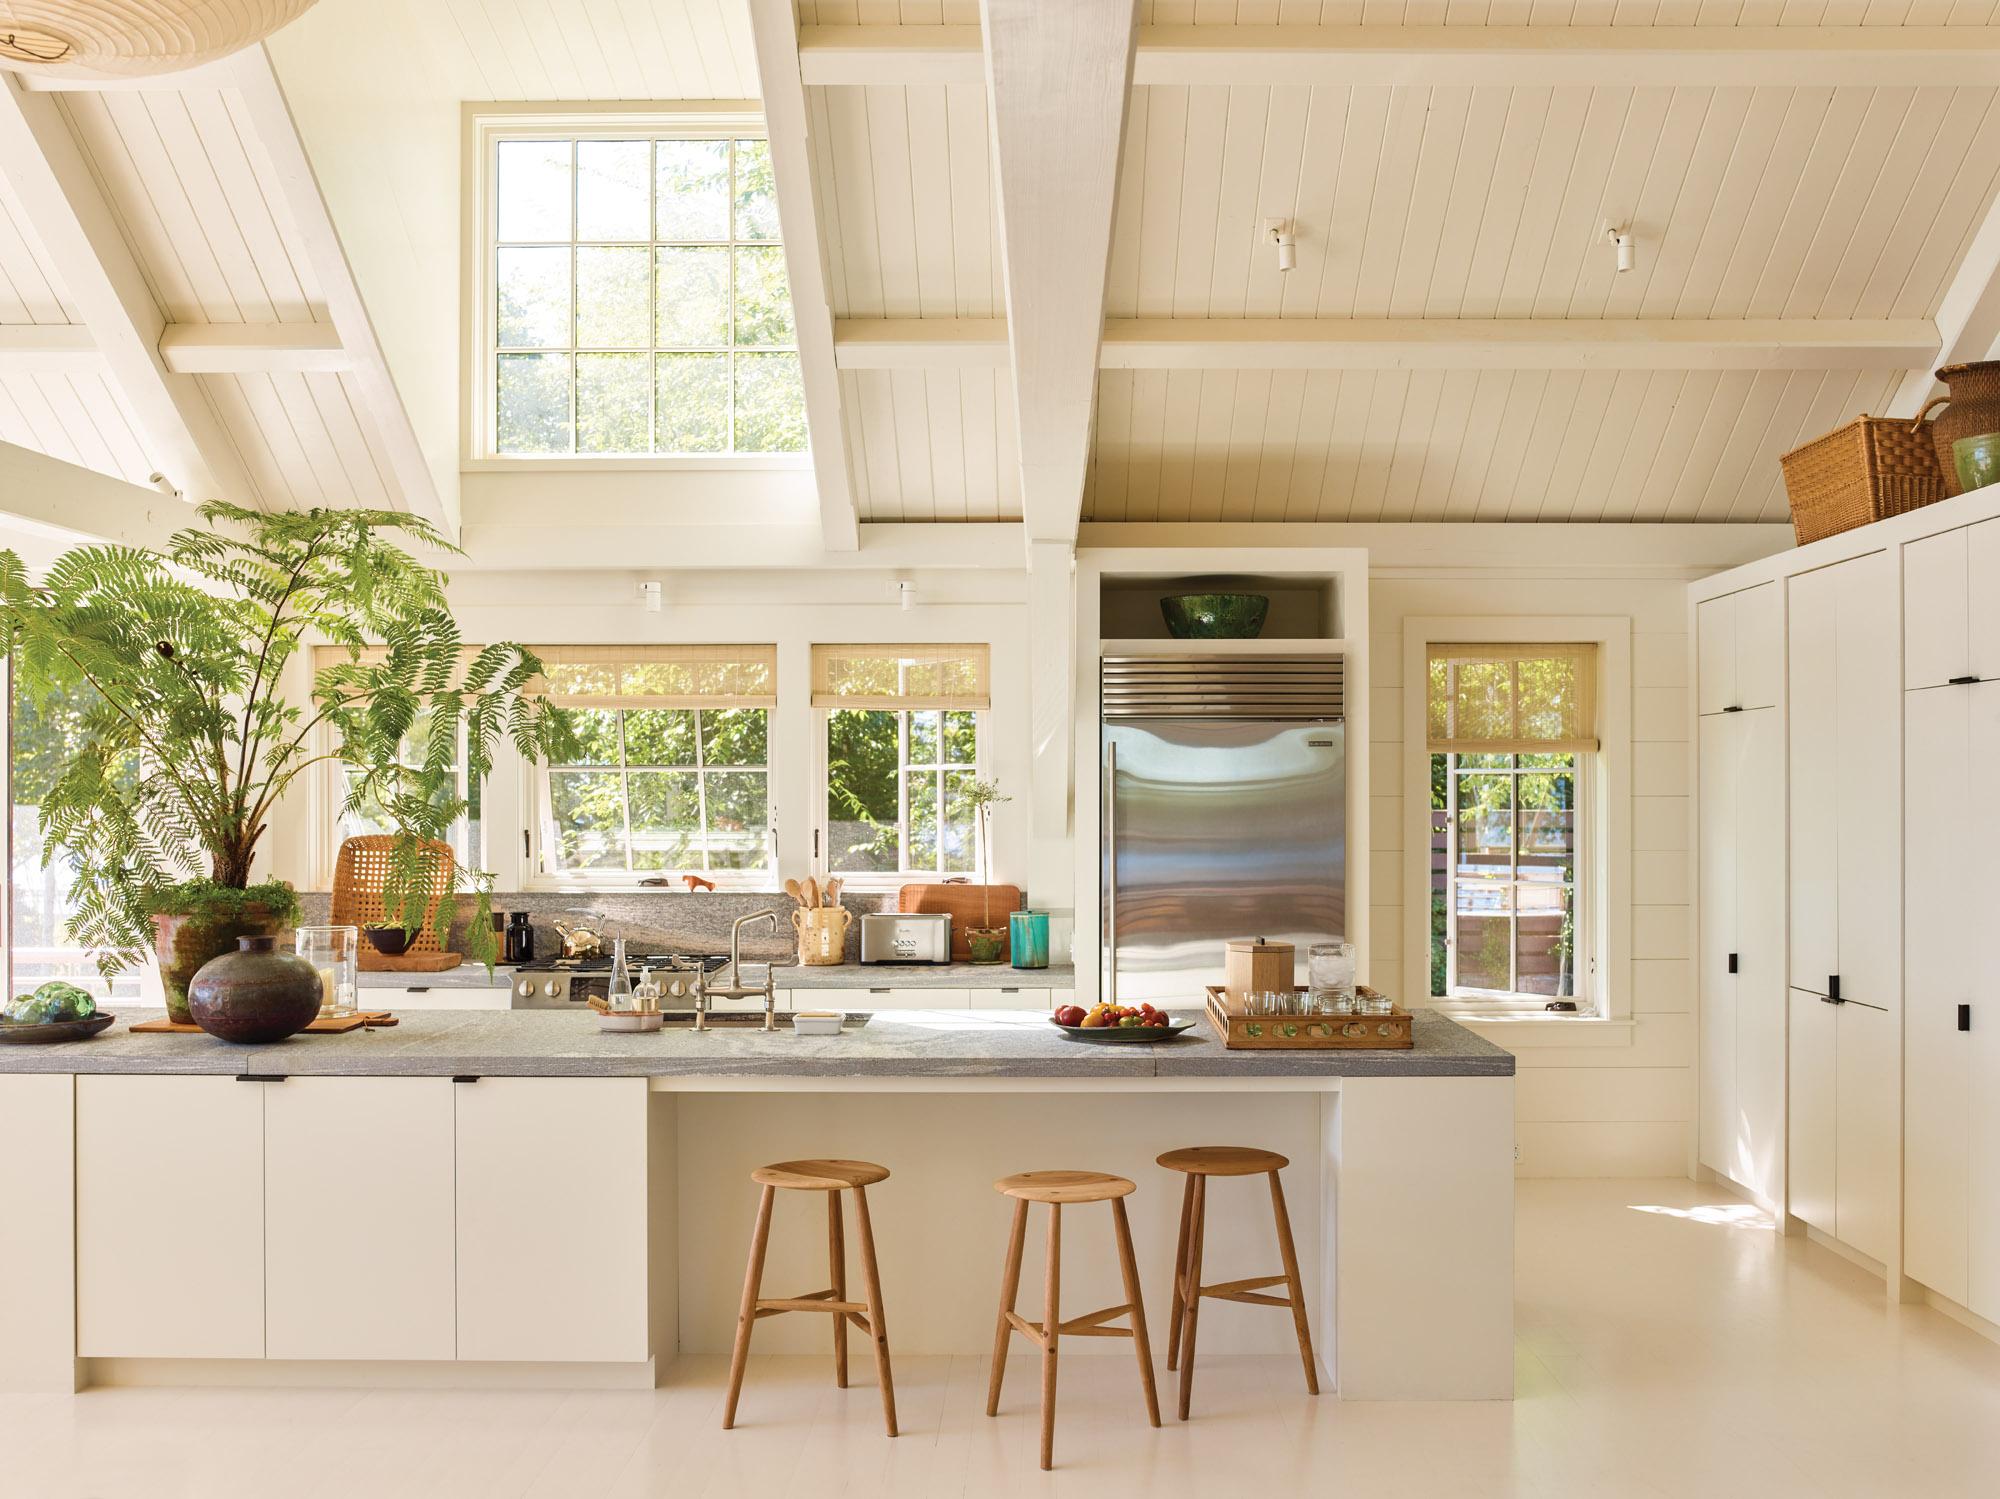 Architect Gil Schafer's Coastal Retreat